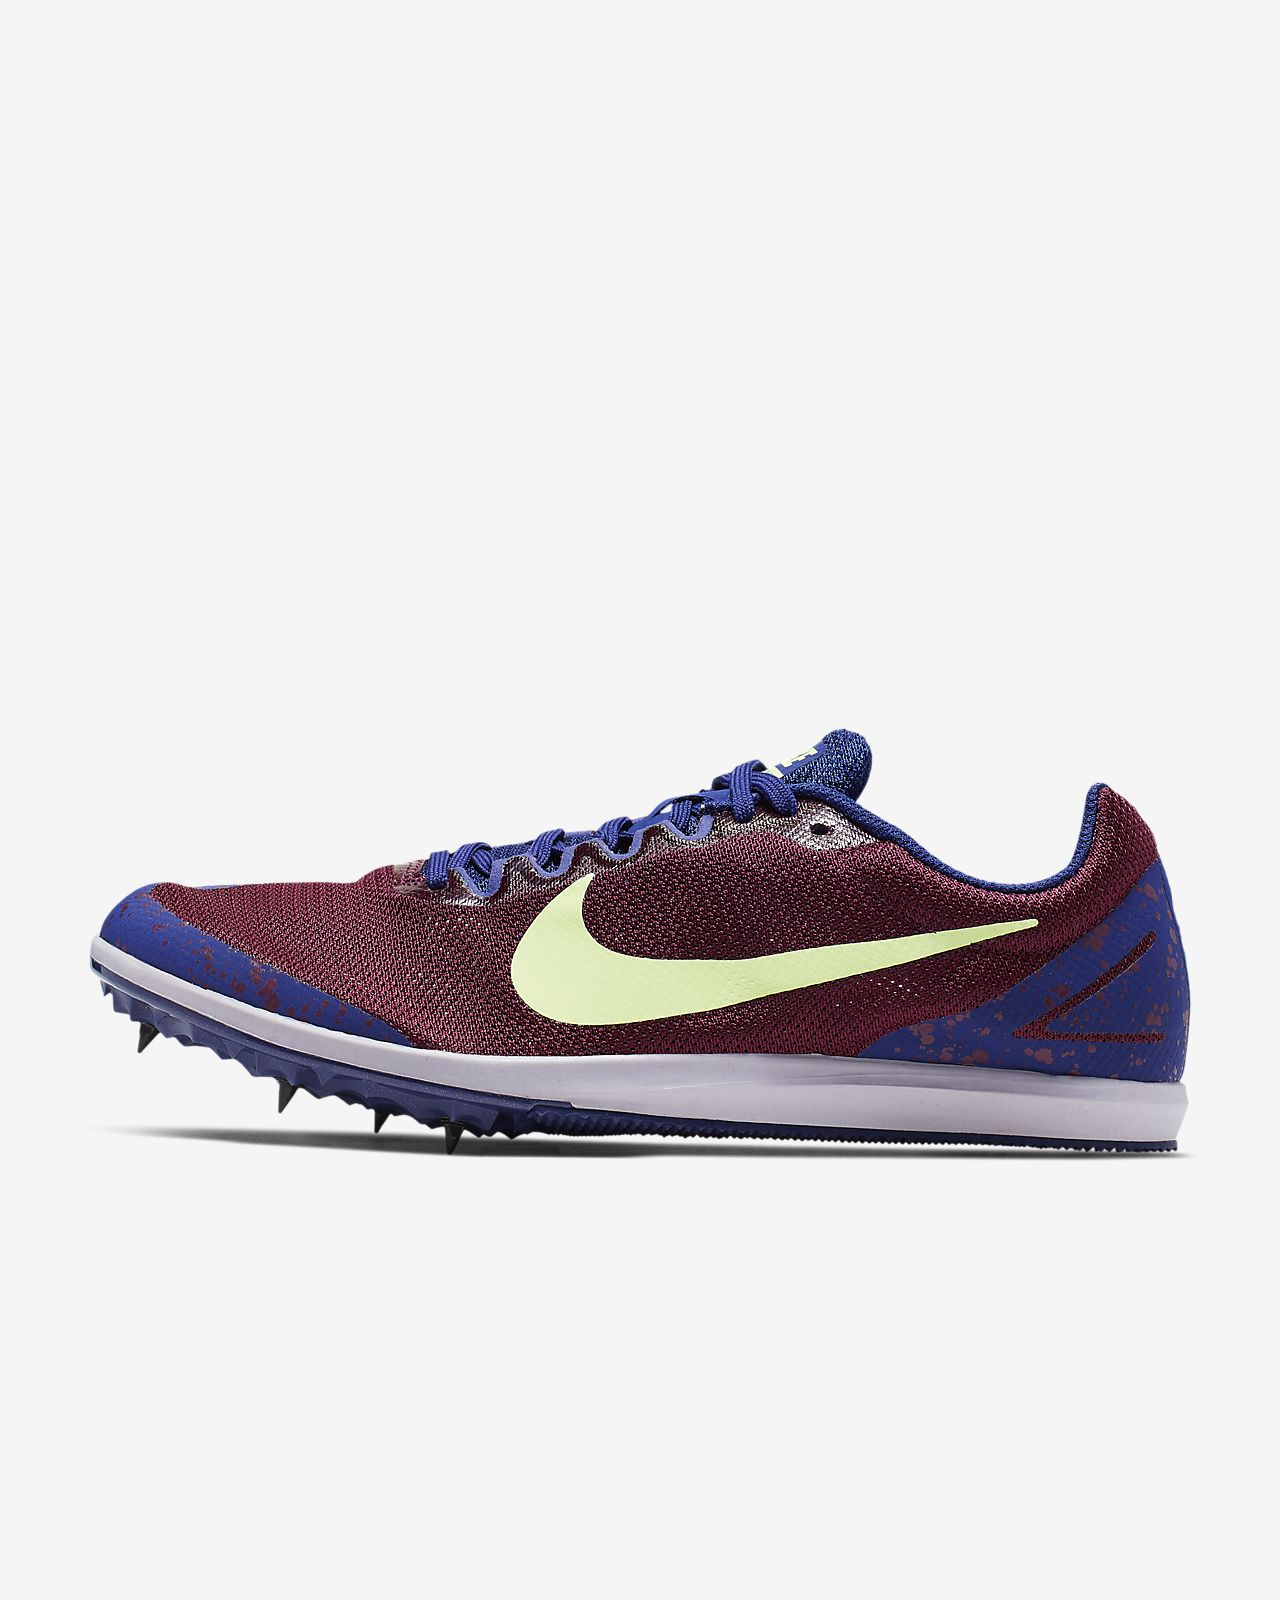 new photos 94e97 e33fc ... Nike Zoom Rival D 10 Women s Track Spike